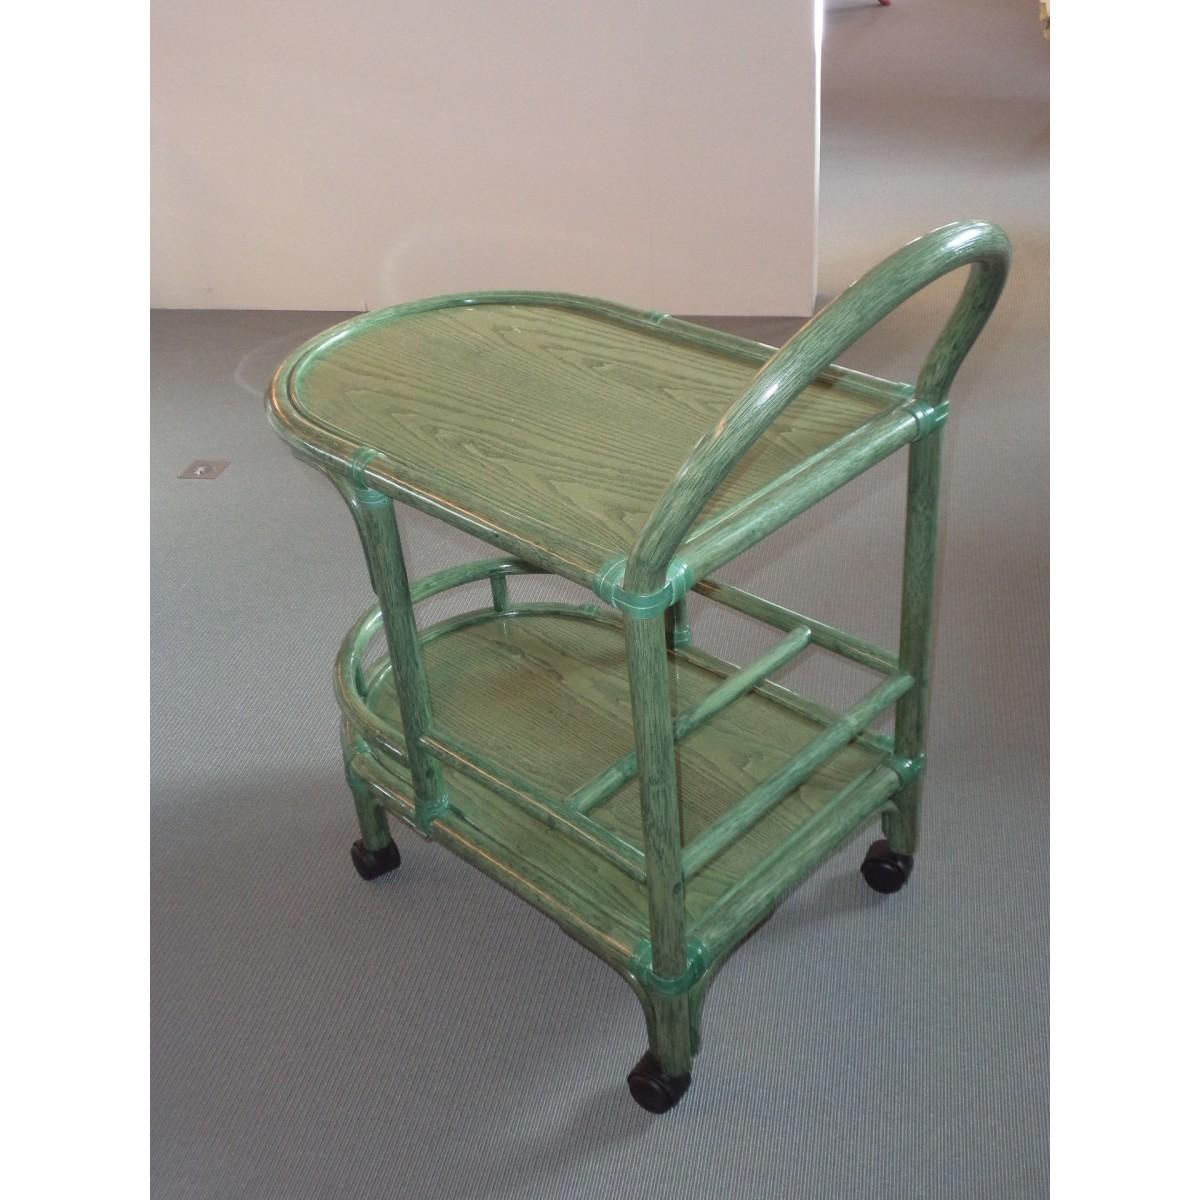 Table Roulante Leeds Verte